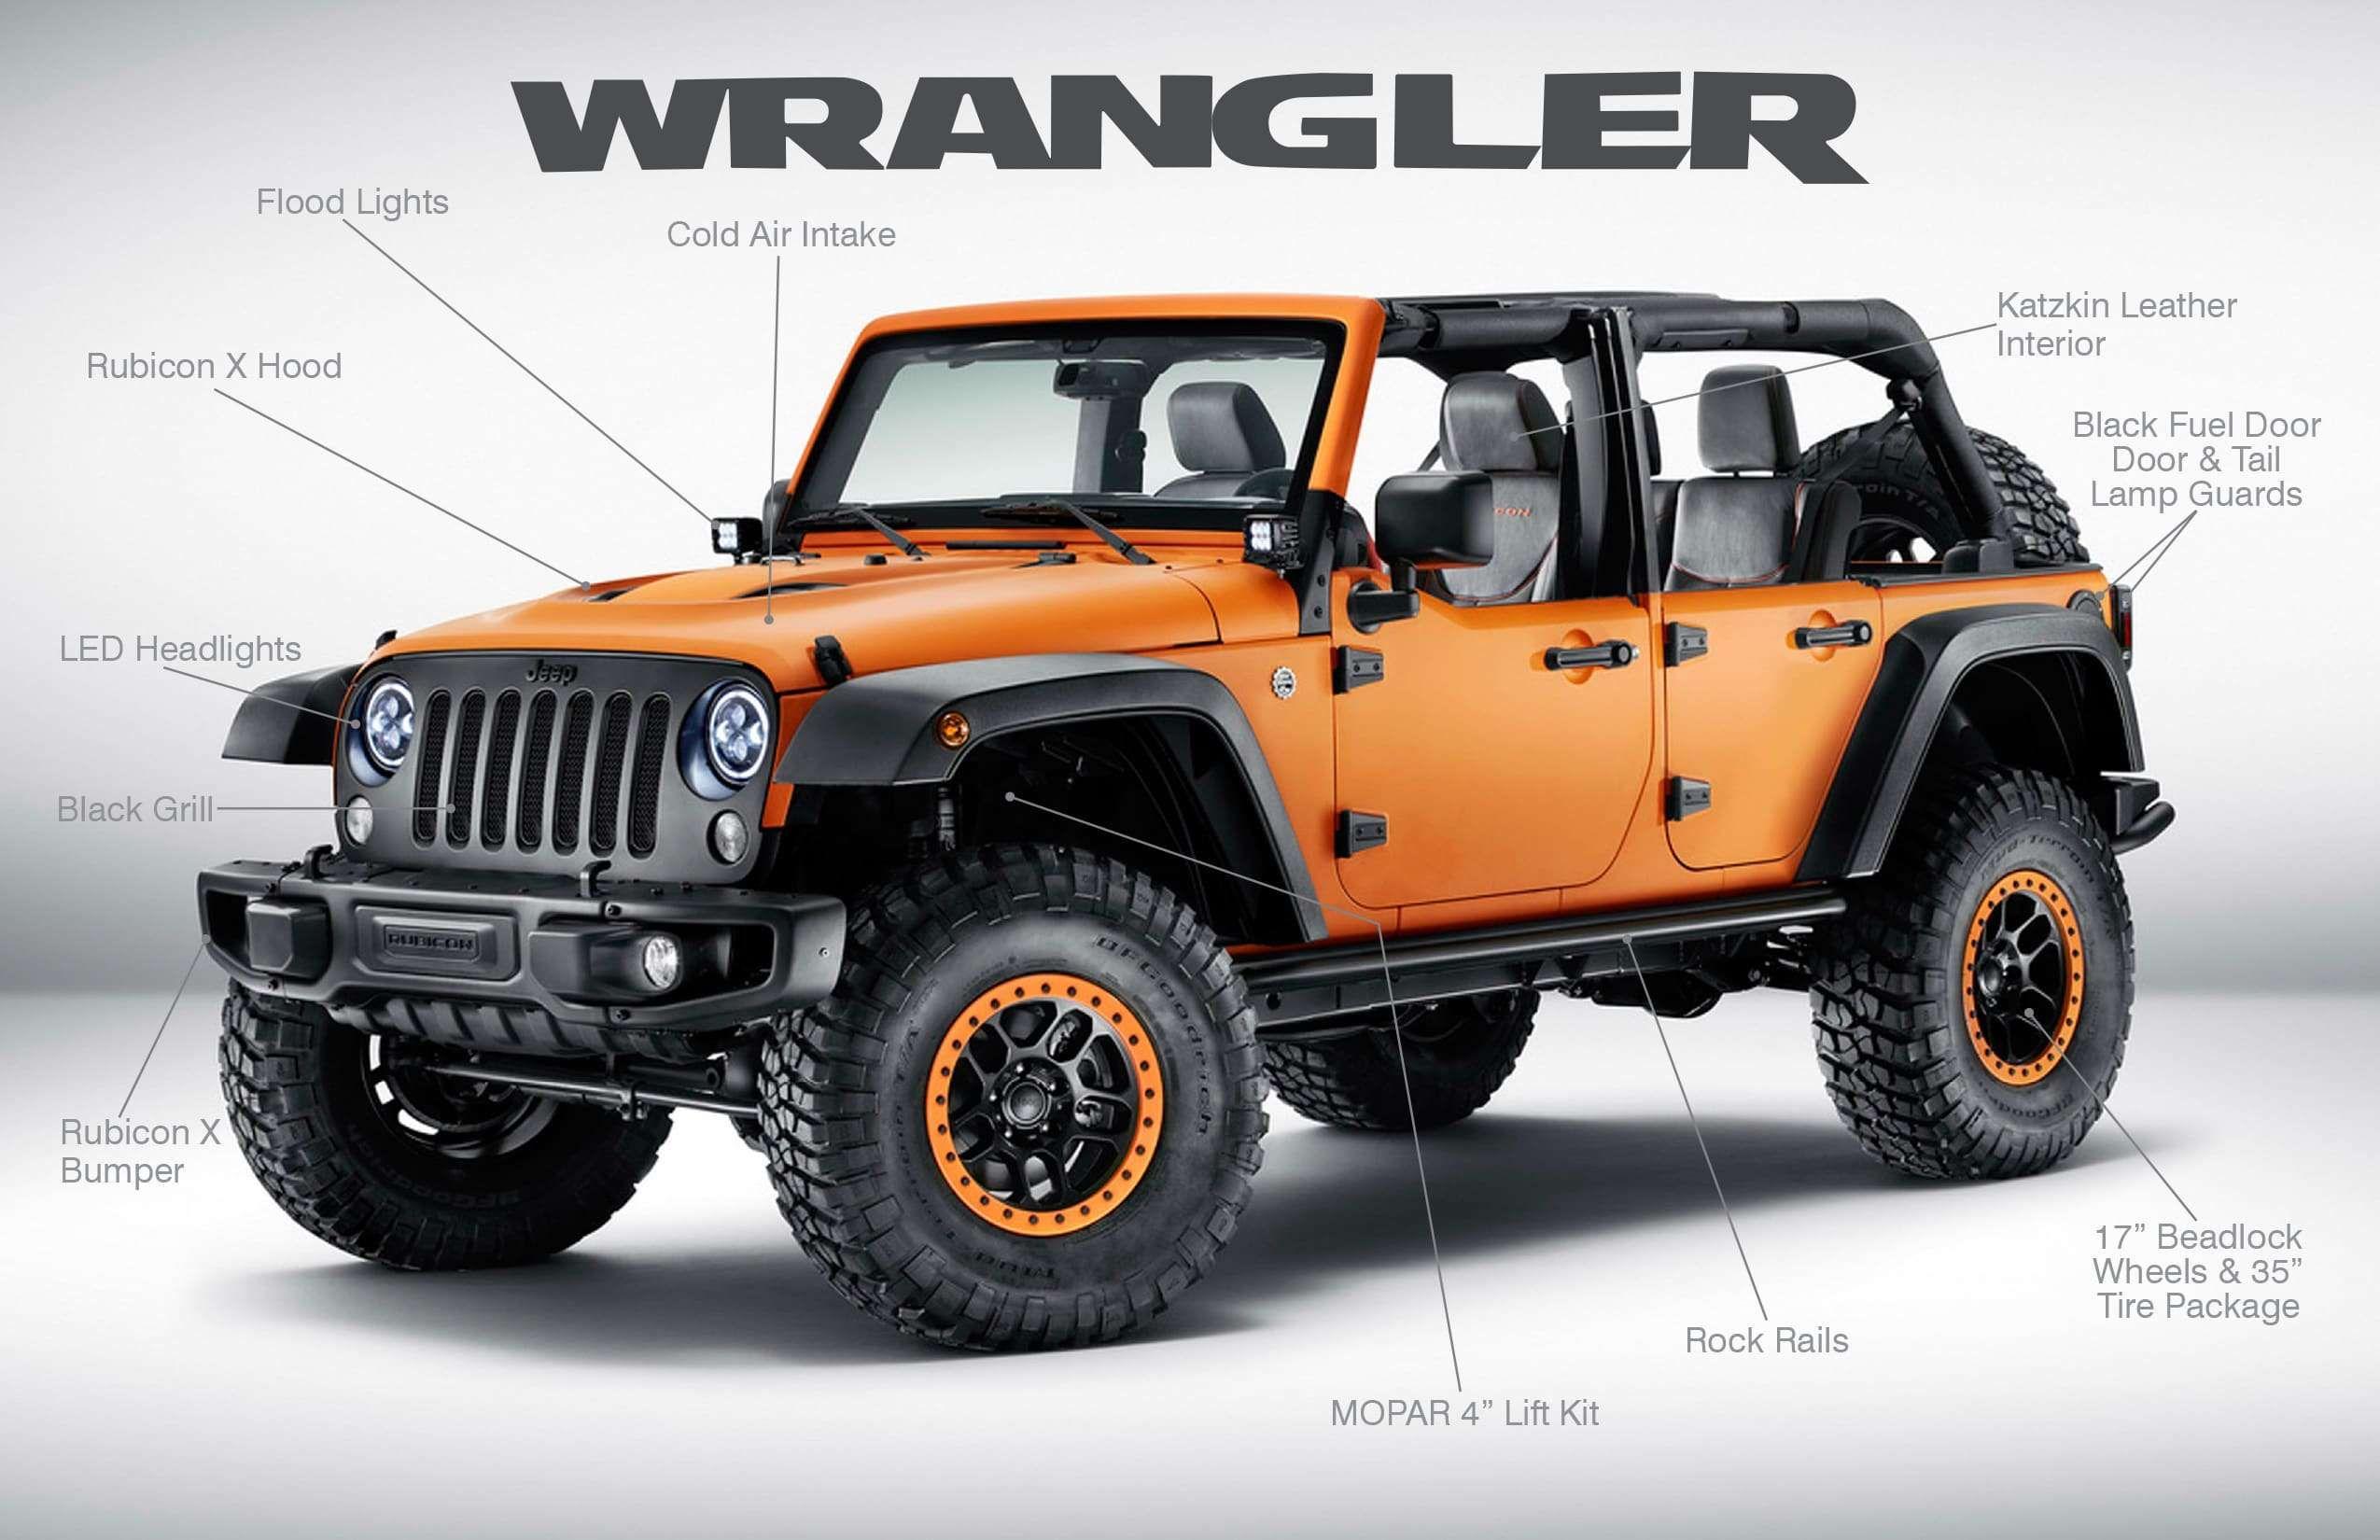 Jeep Wrangler Accessories New Cerritos Anaheim Ca Jeep Wrangler Accessories Jeep Wrangler Rubicon Wrangler Rubicon Jeep Wrangler